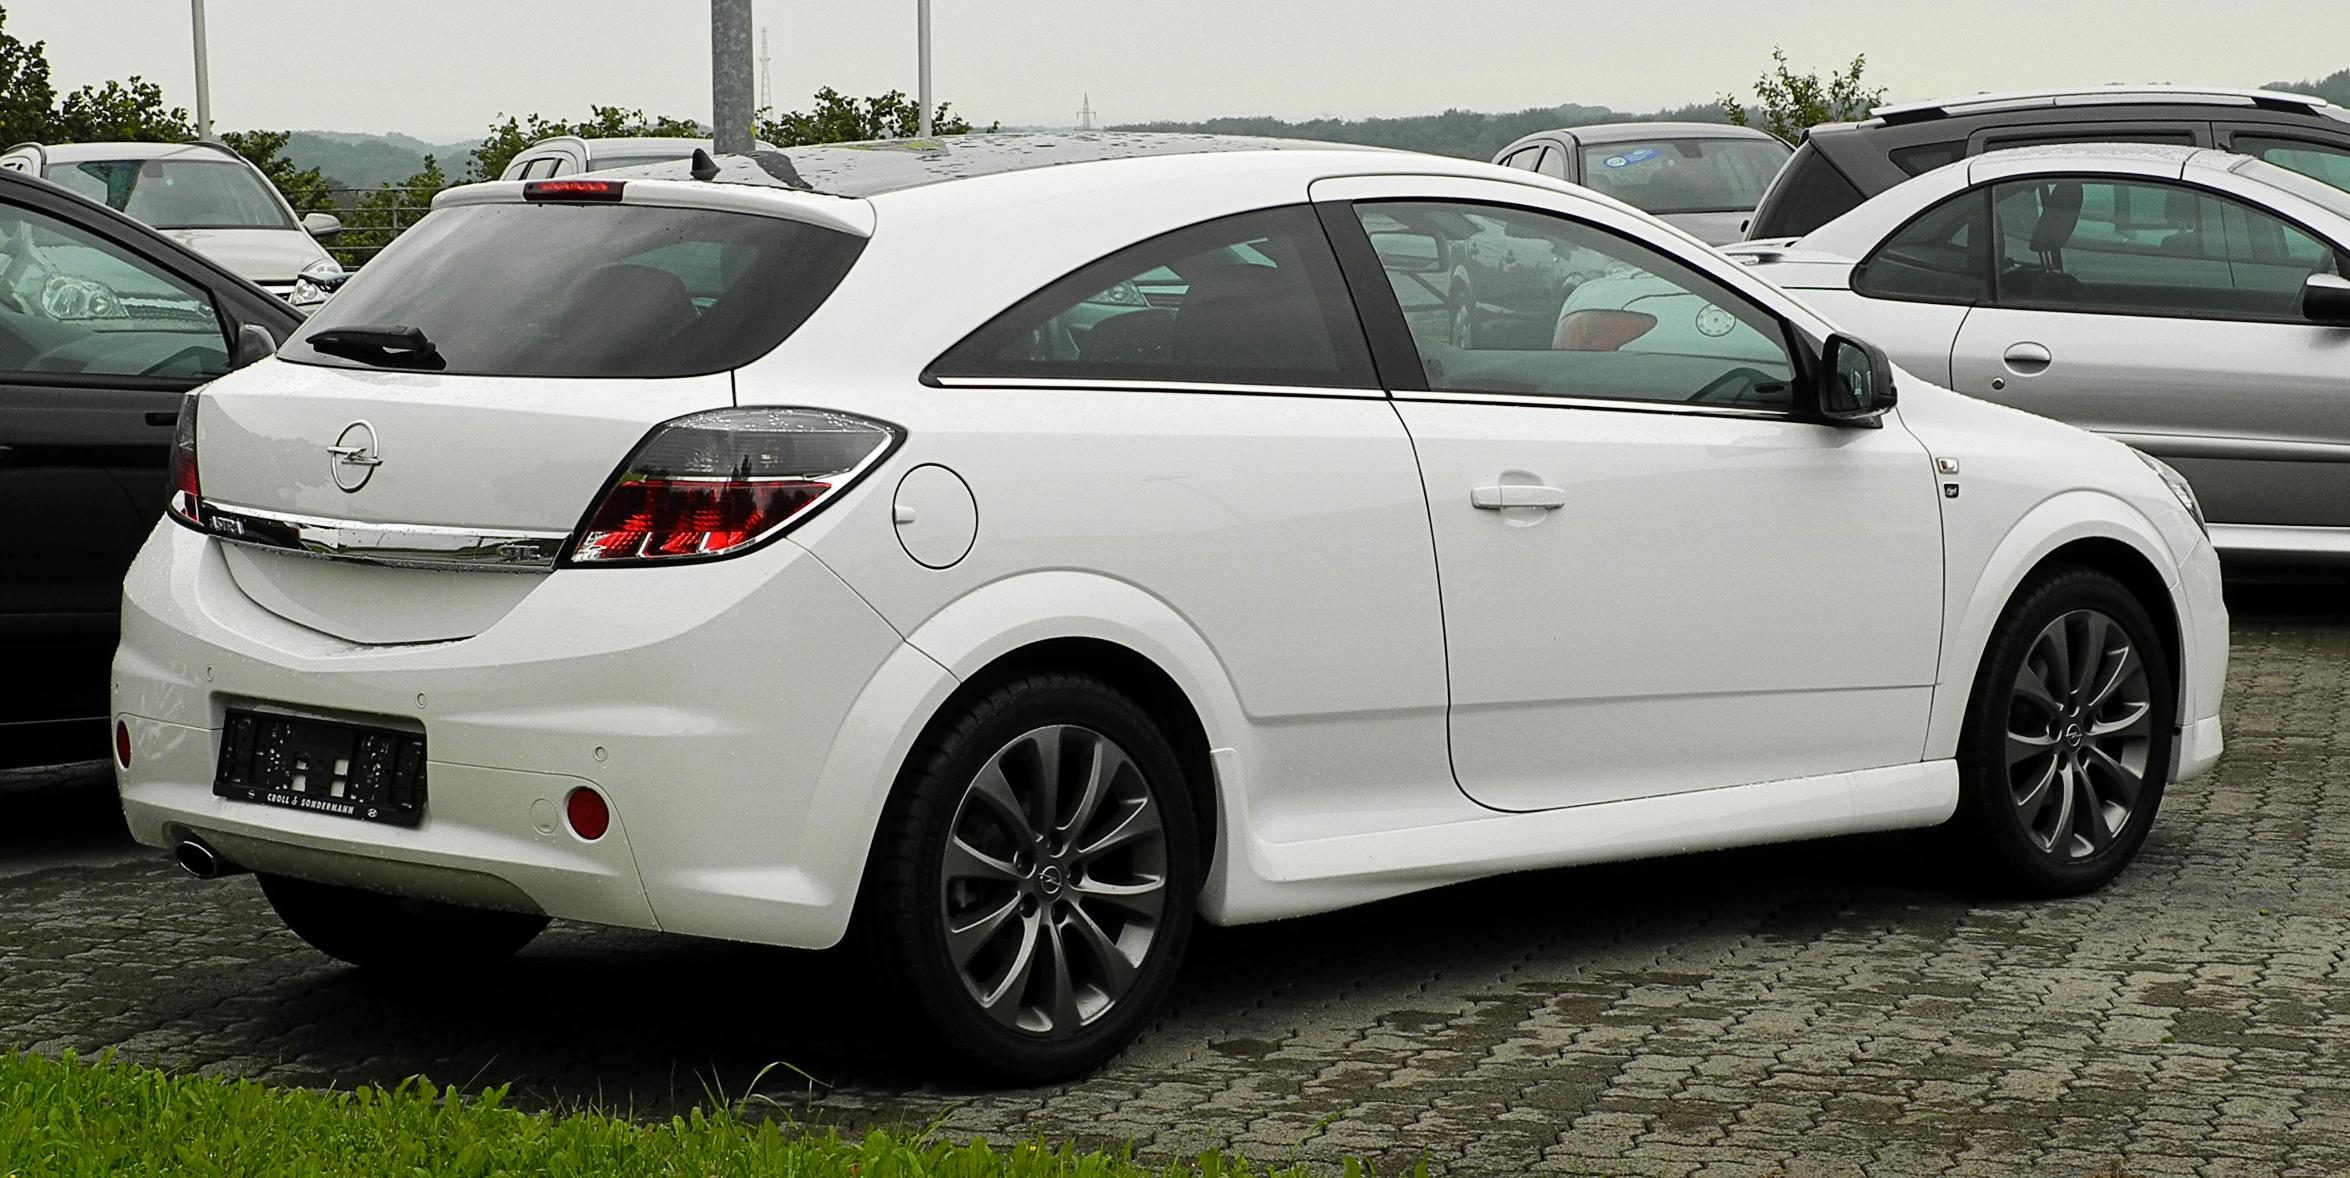 Datei:Opel Astra GTC 1.6 ECOTEC Black & White (H, Facelift ...